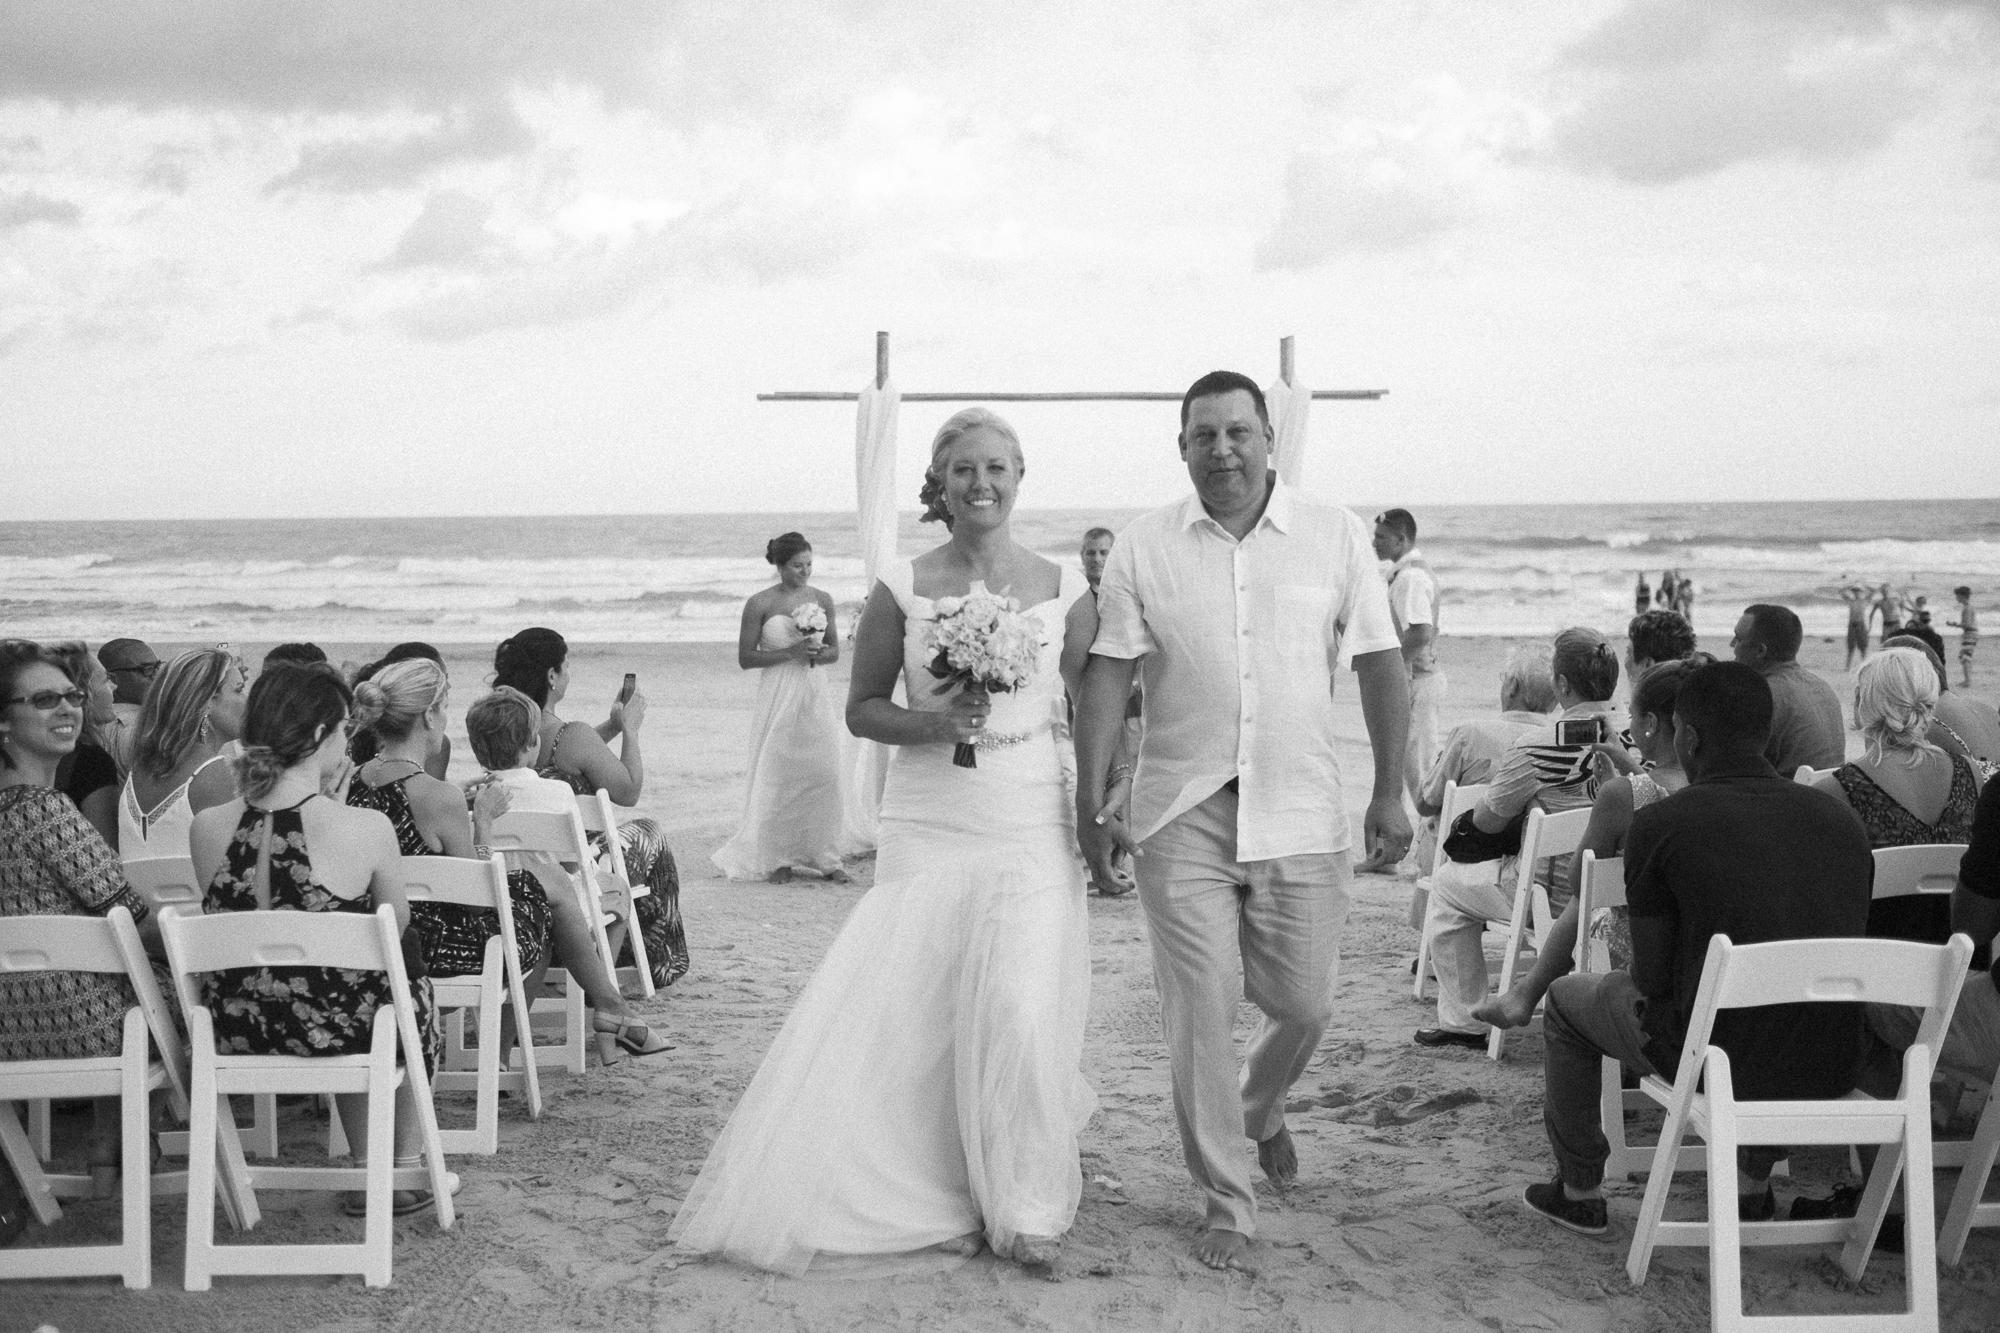 Stephanie-Mike-wedding-blog-20.jpg